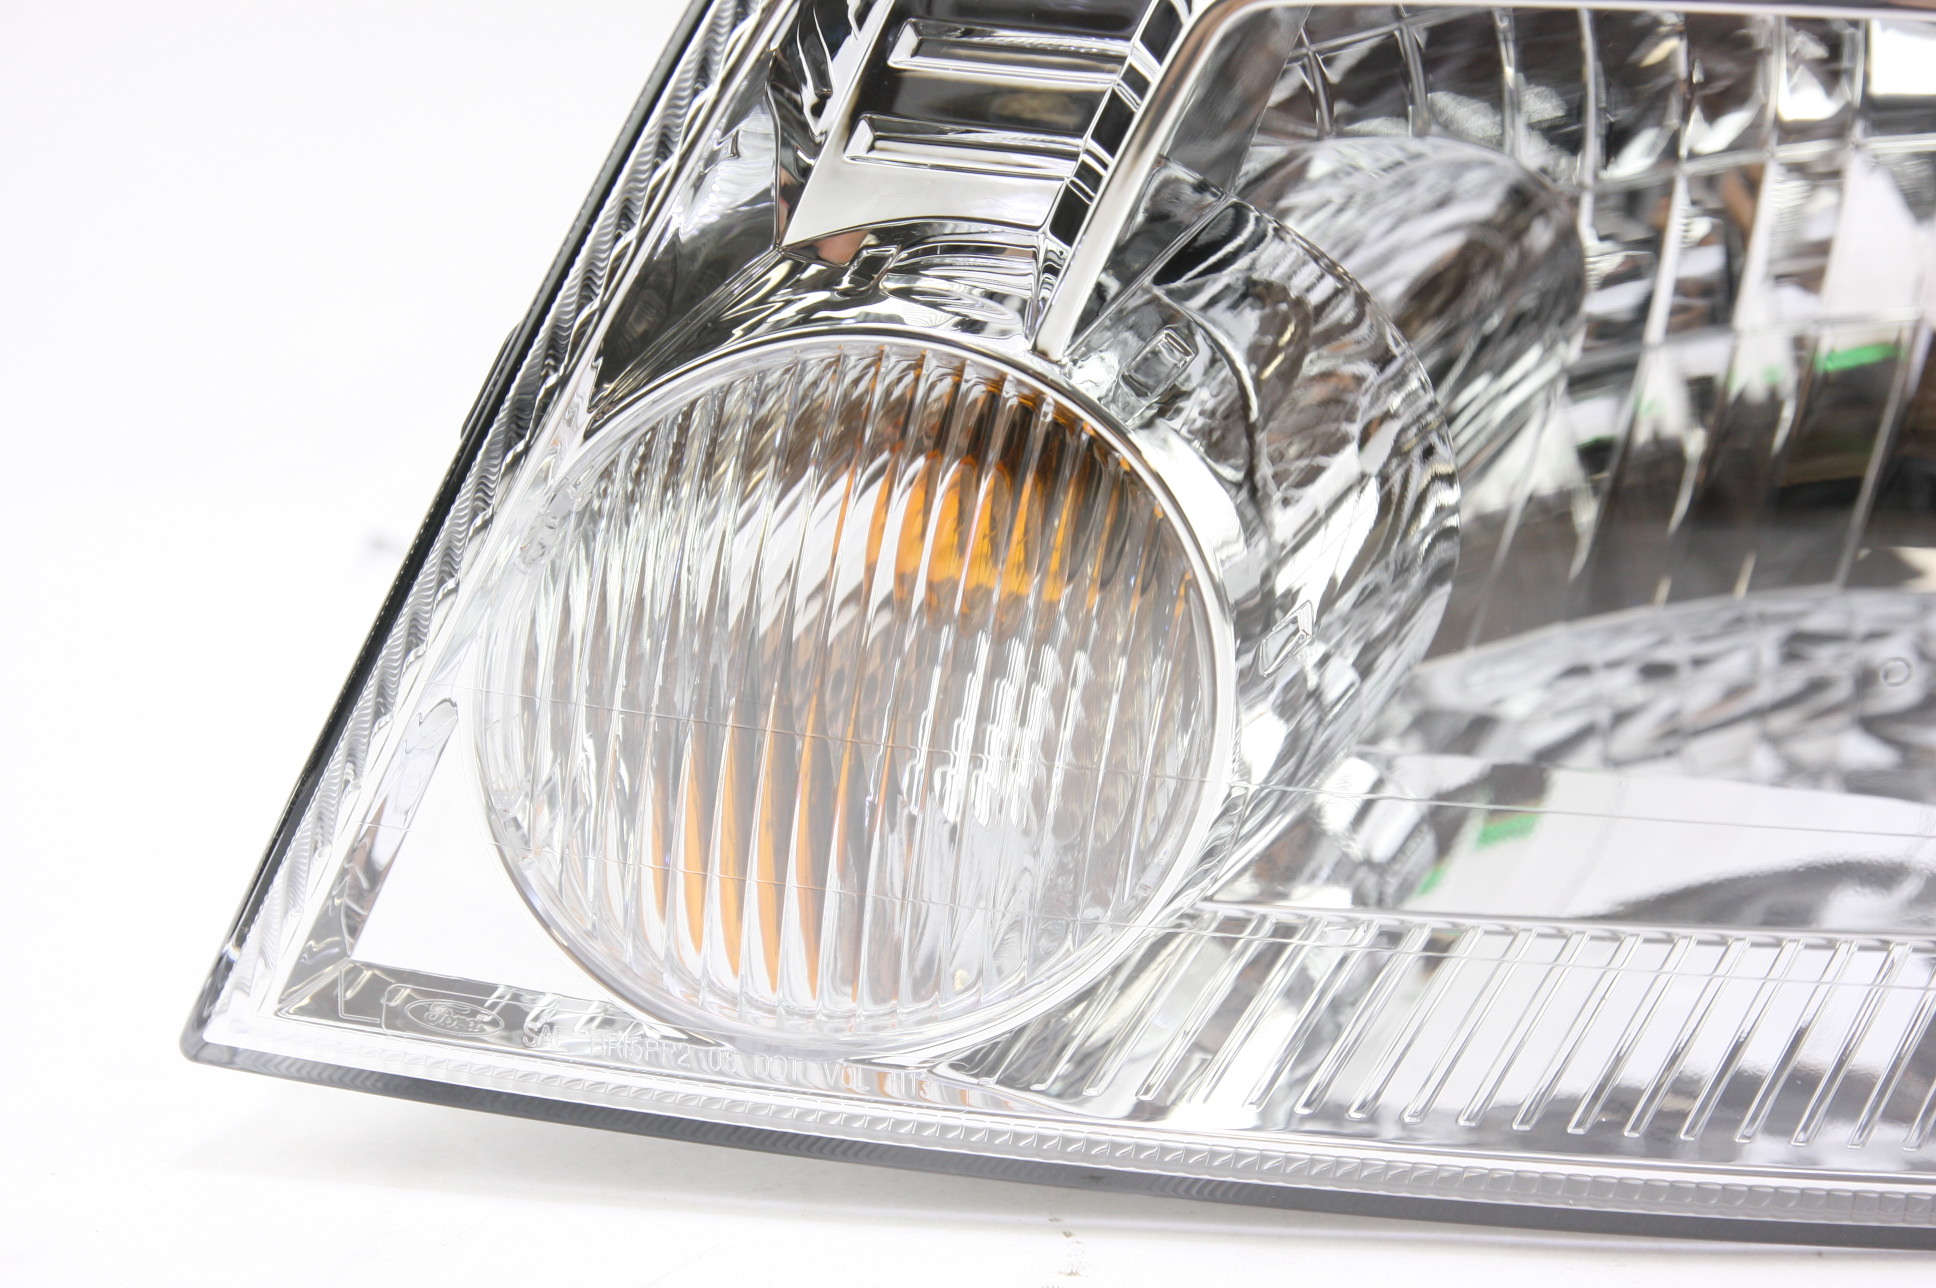 **** New OEM 5E6Z13008BA Mercury Mariner 05-07 LH Driver Side Headlight Headlamp - image 3